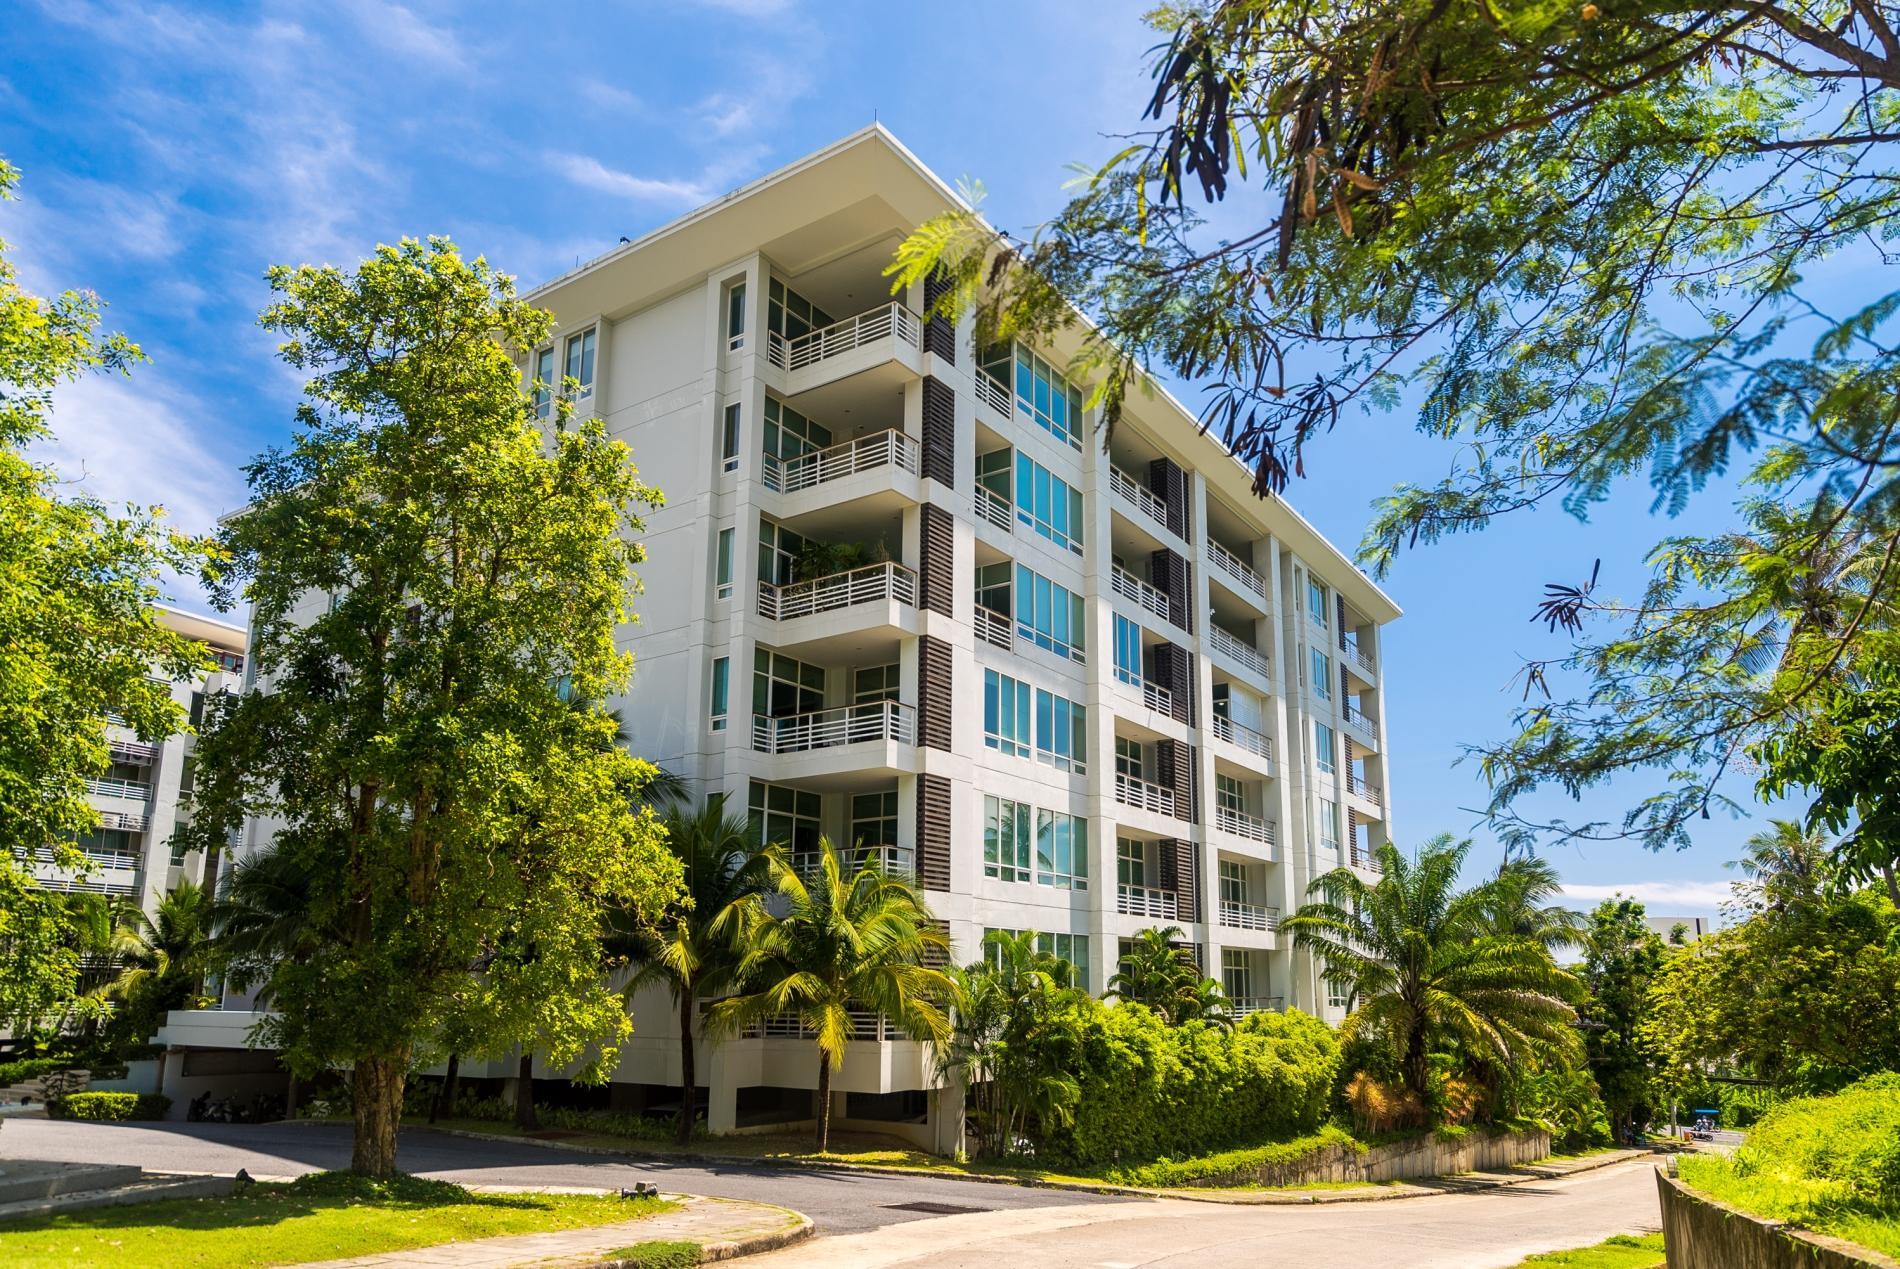 Apartment KH2605 - Sea-view Penthouse in Karon  walk to beach  restaurants  bars  shops photo 20179451